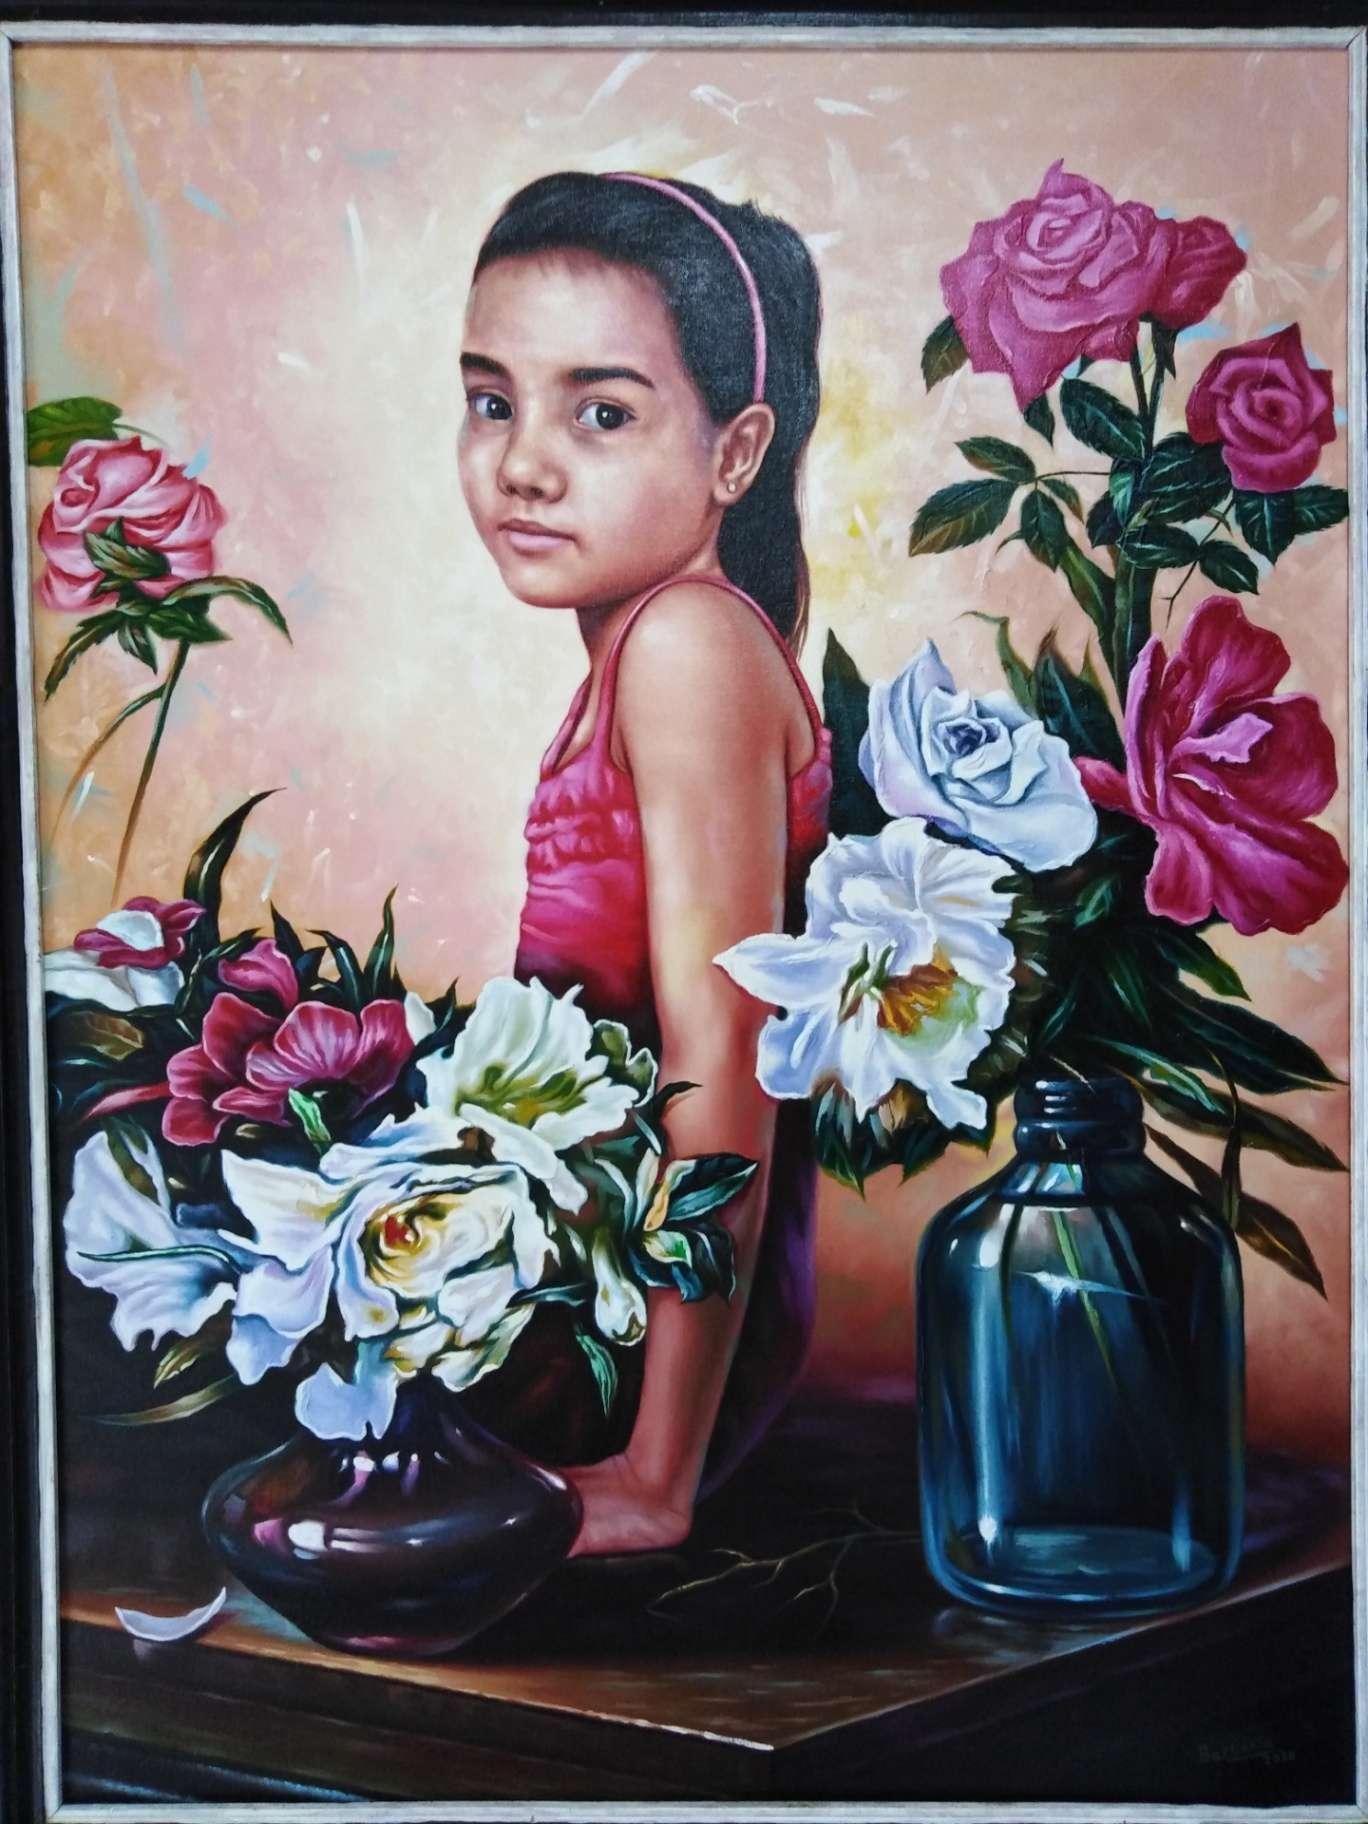 Obra: Mi pequeña flor